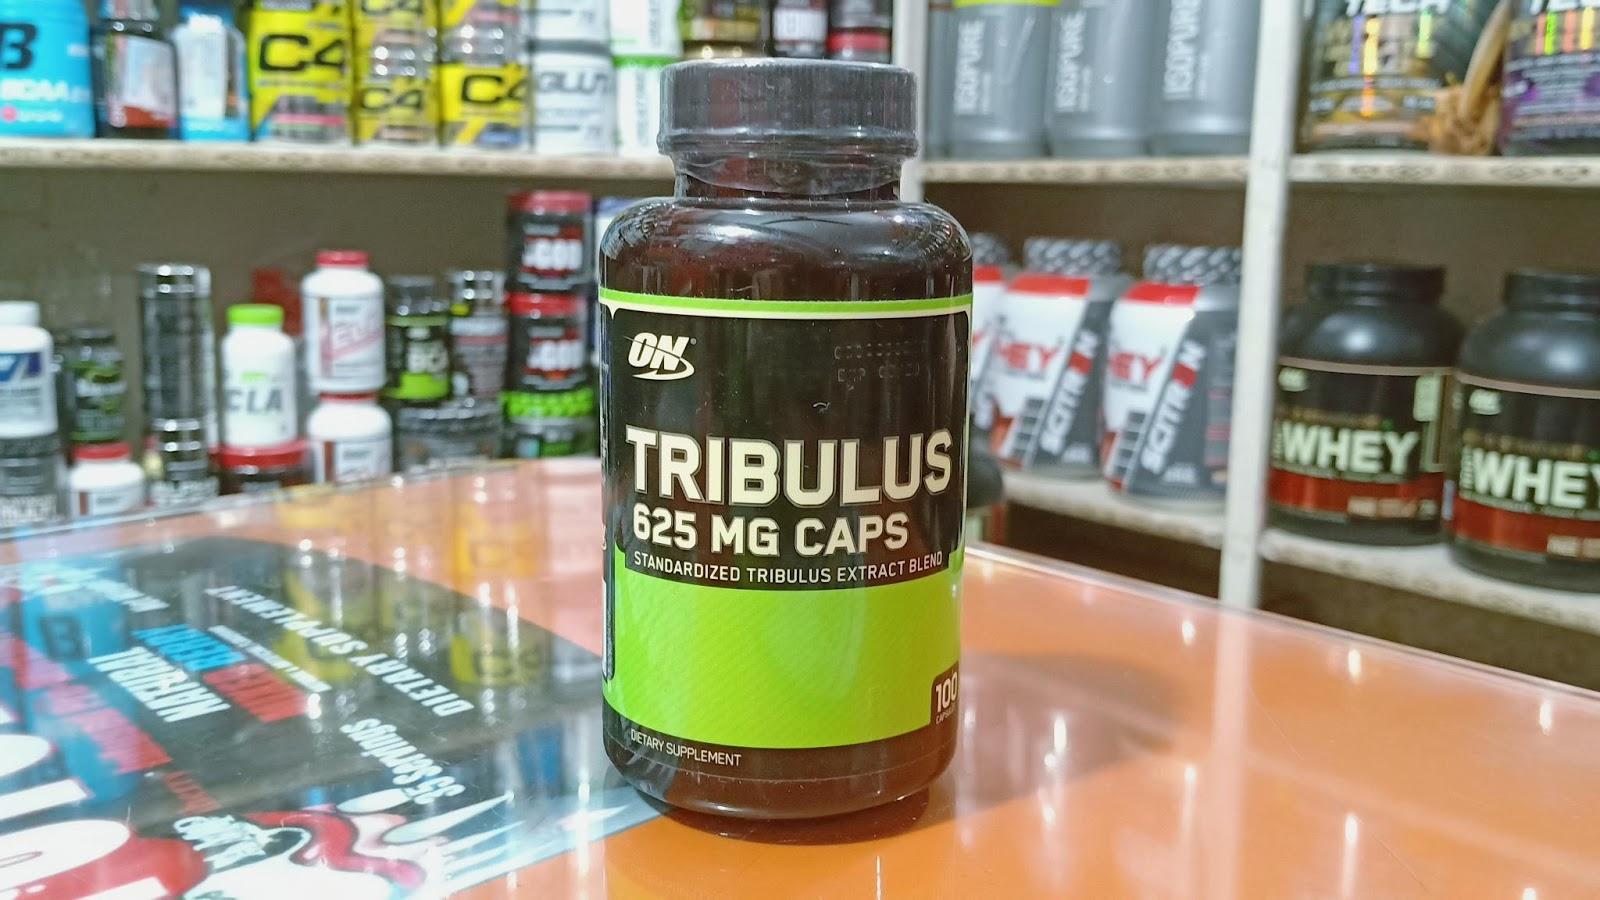 Optimum Nutrition Tribulus - 625 mg